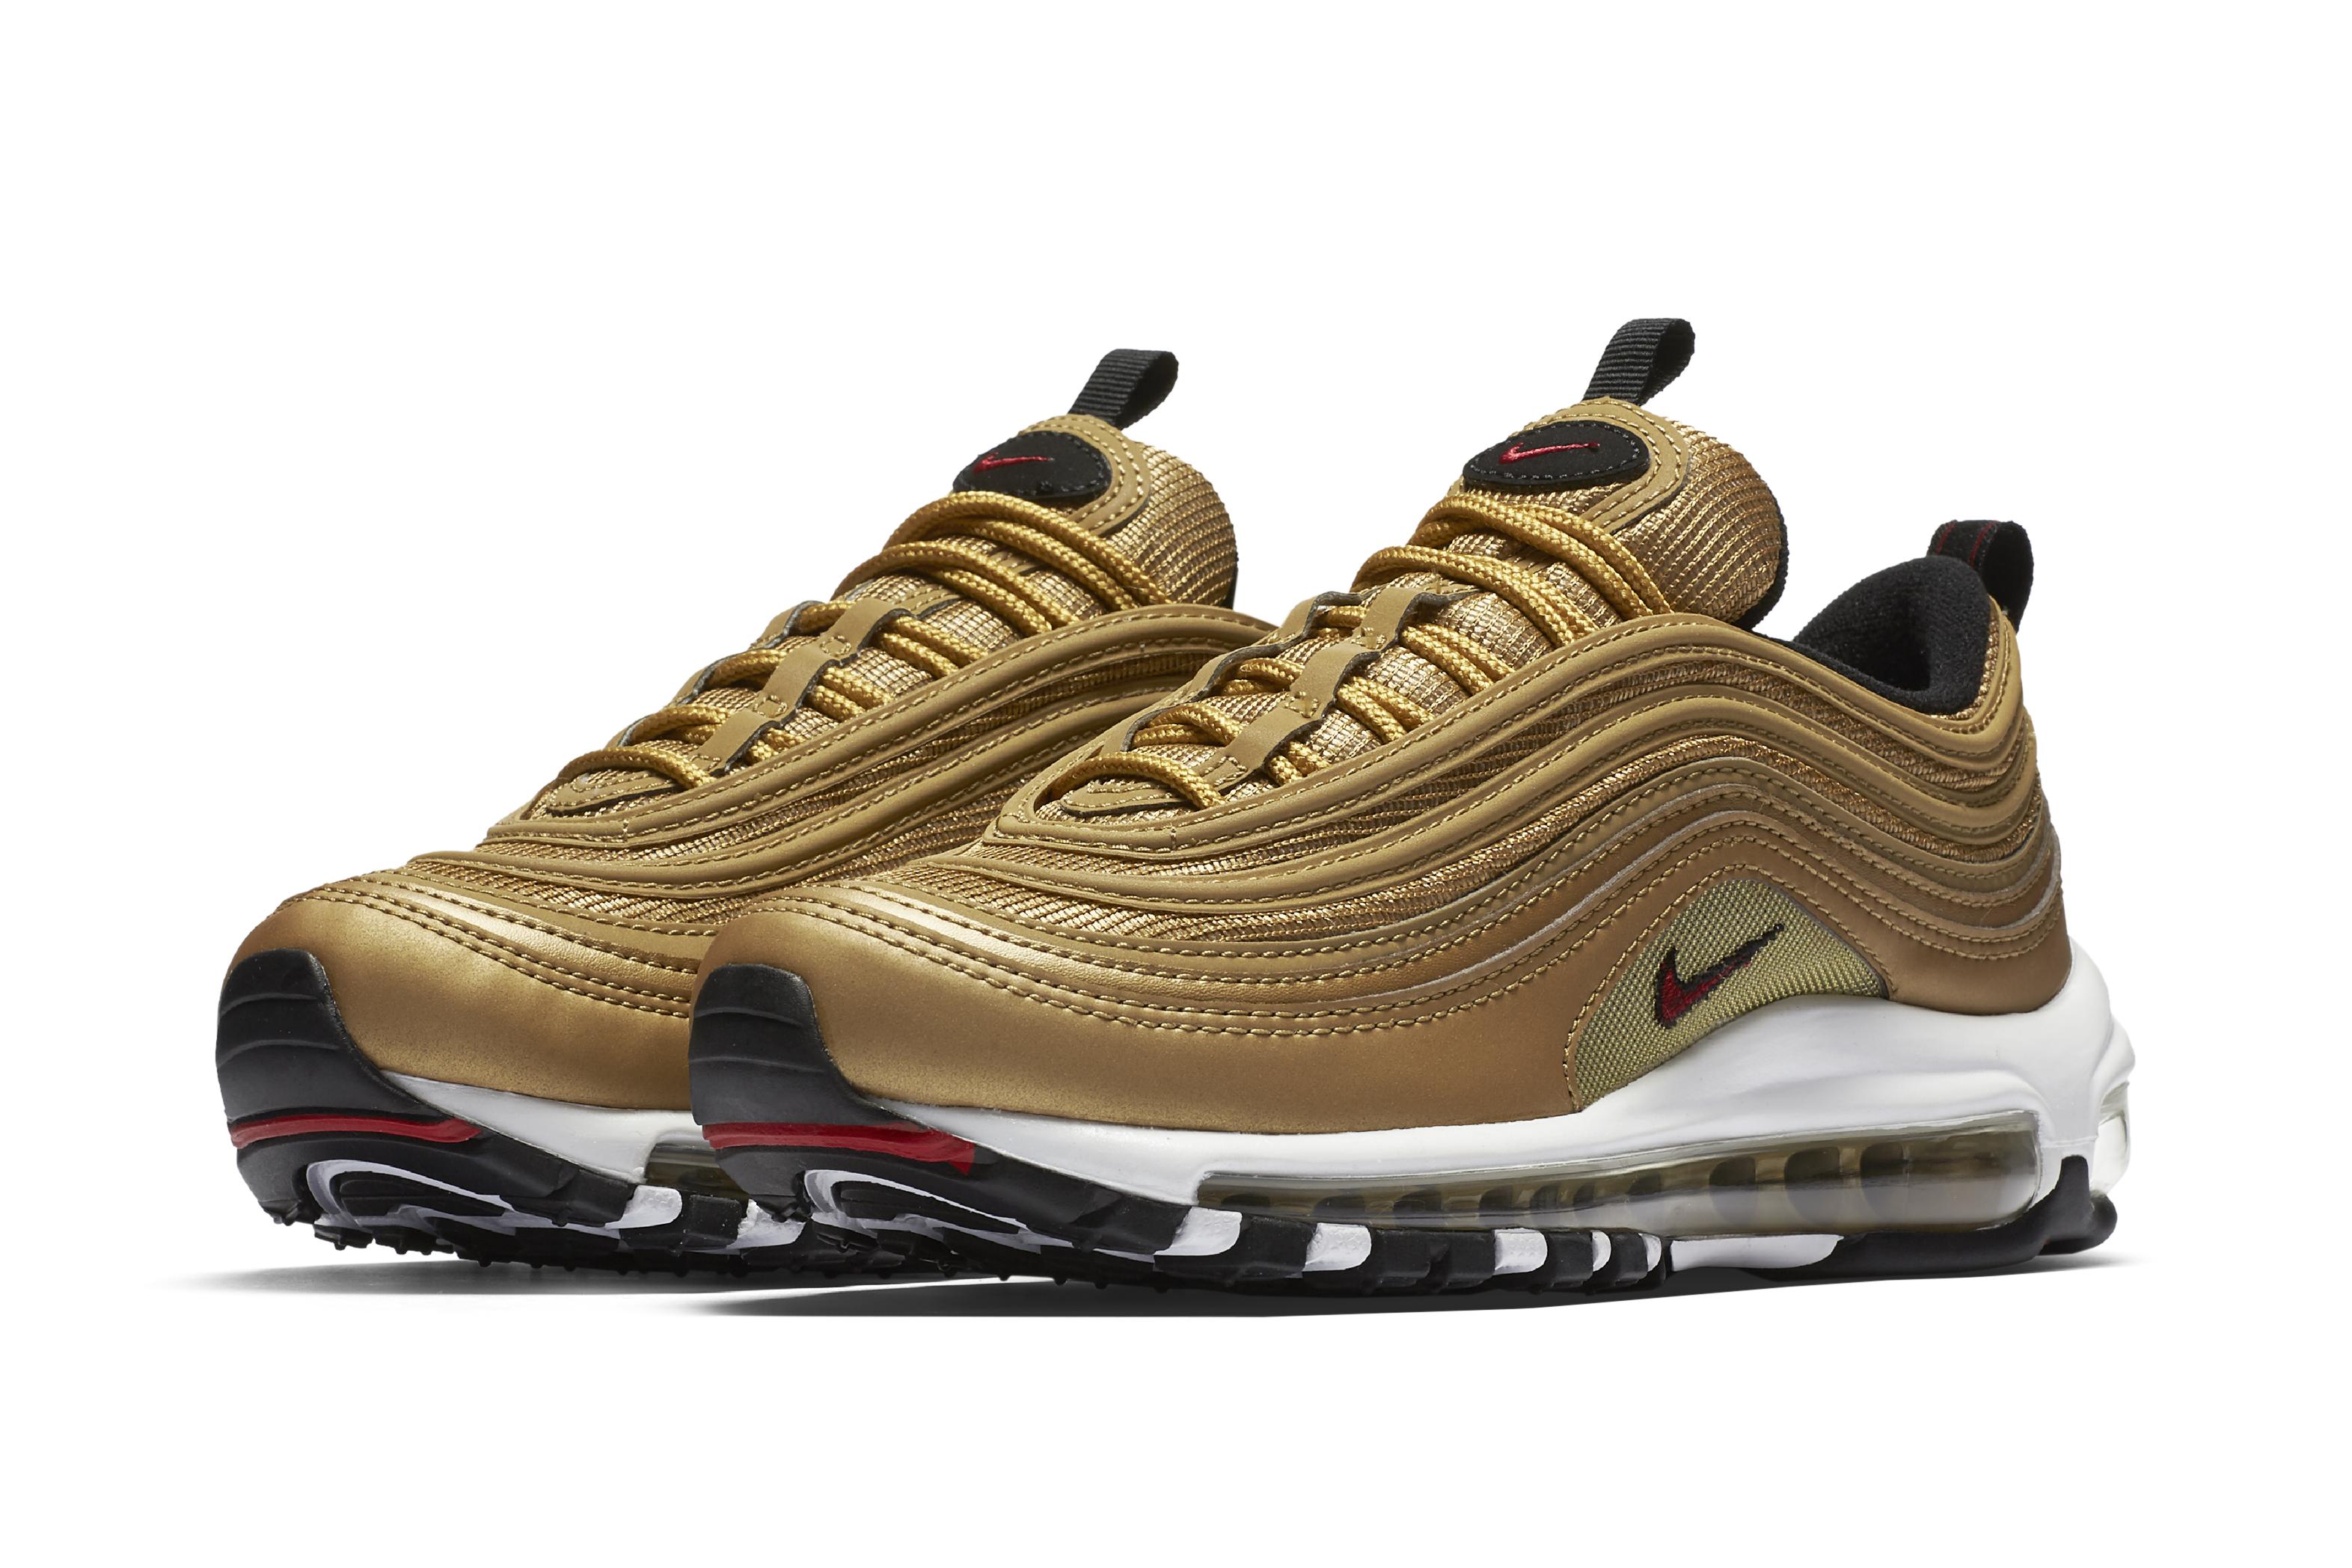 Nike Air Max 97 'Gold'